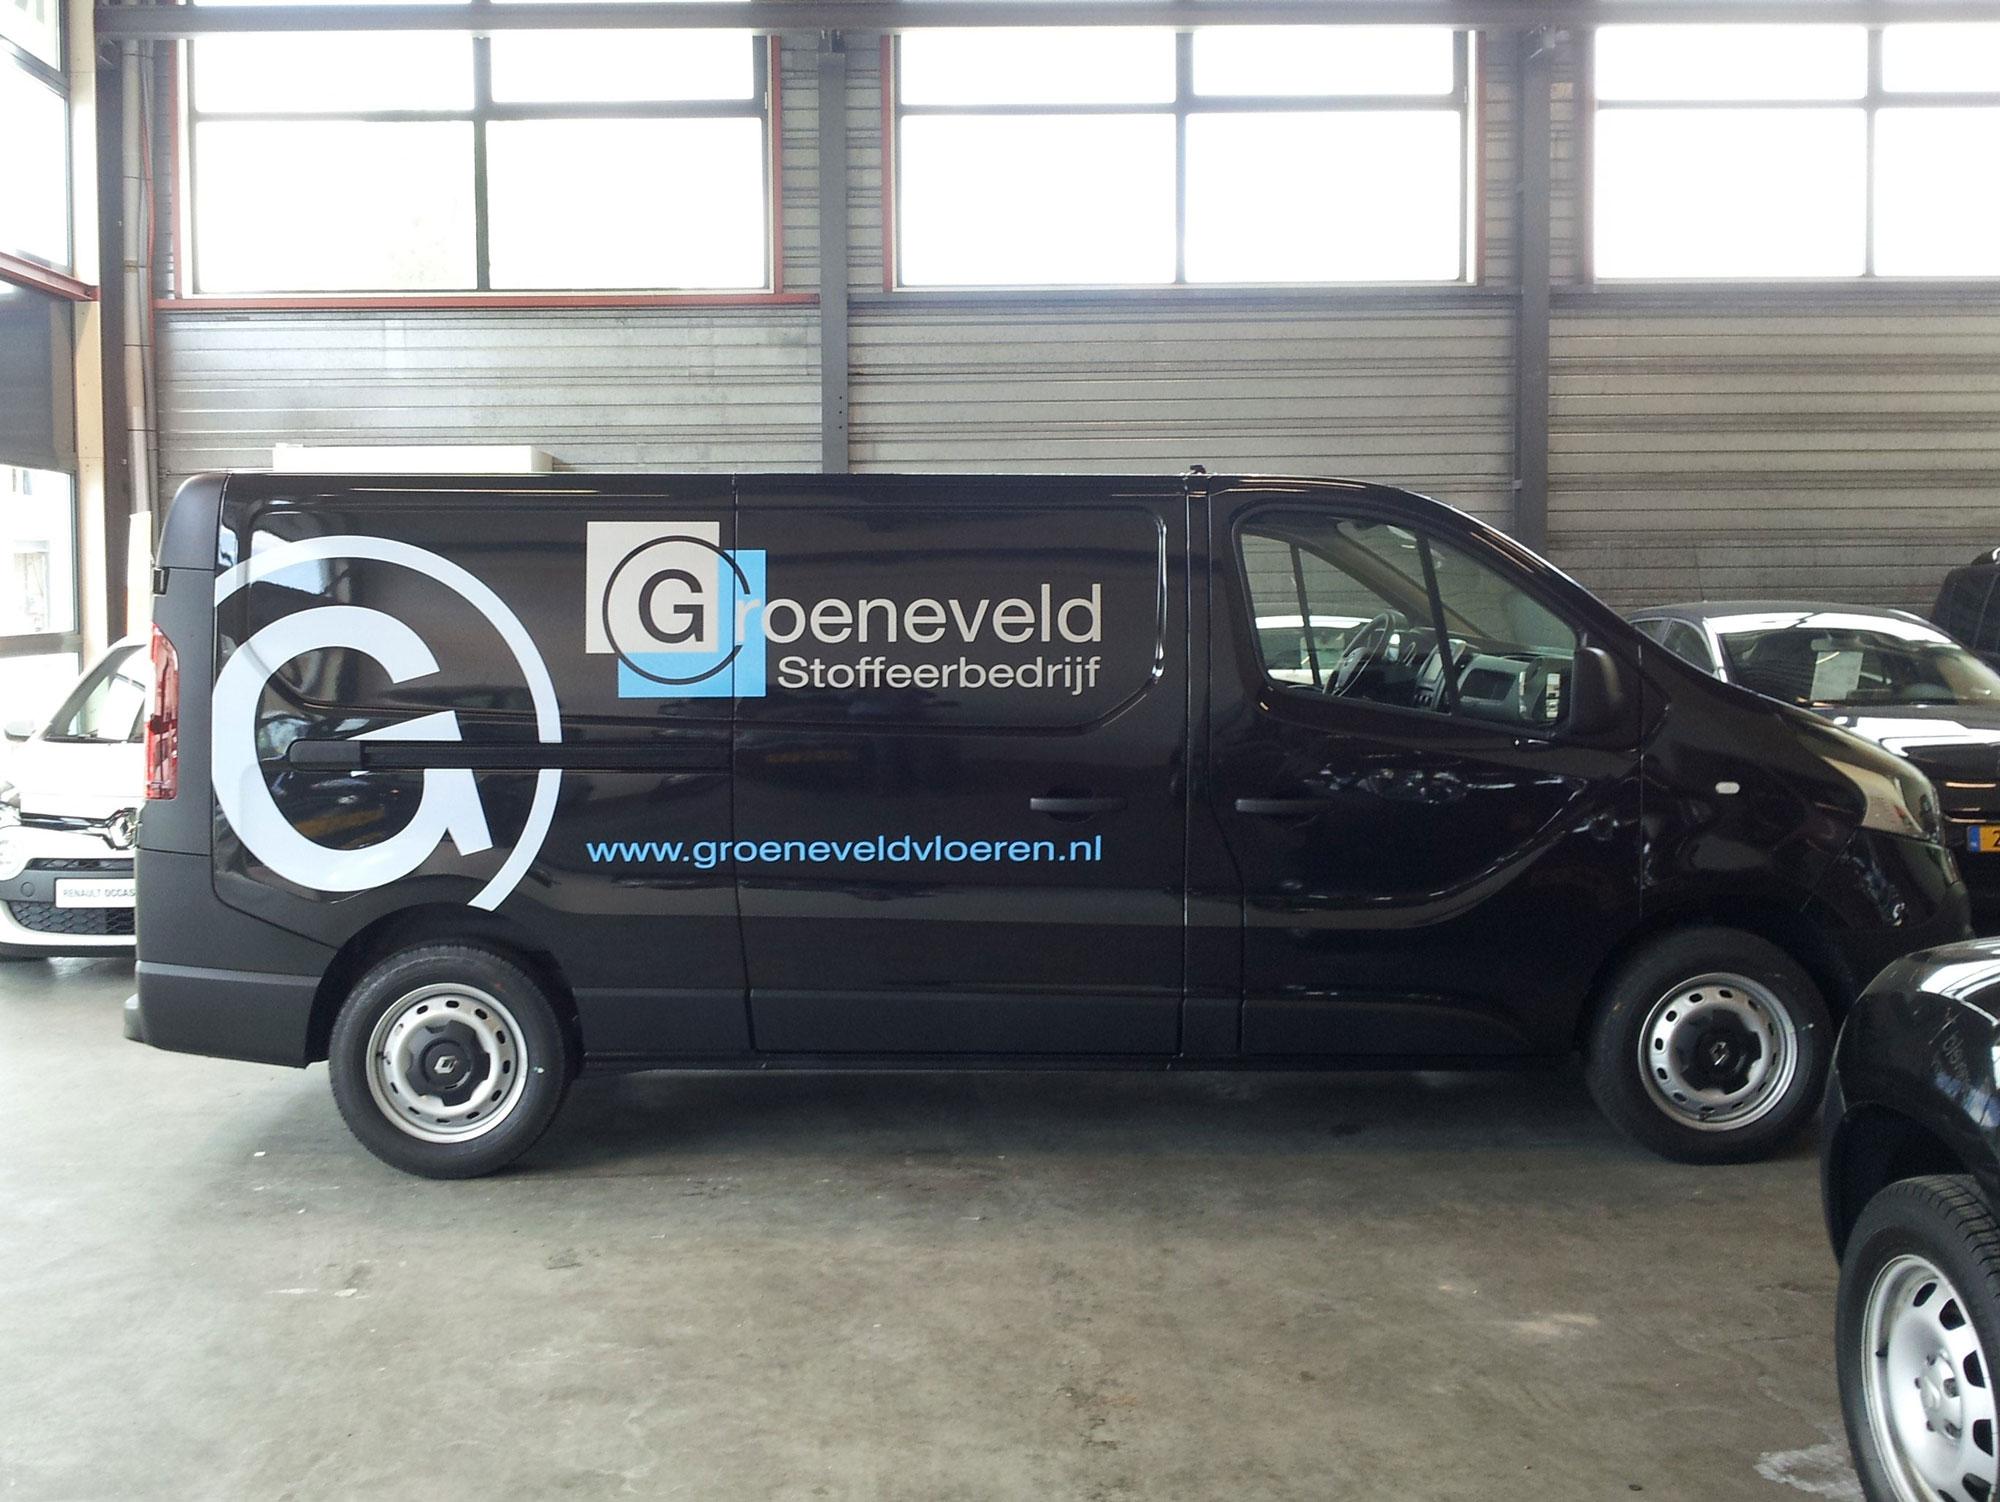 Groeneveld-autobelettering